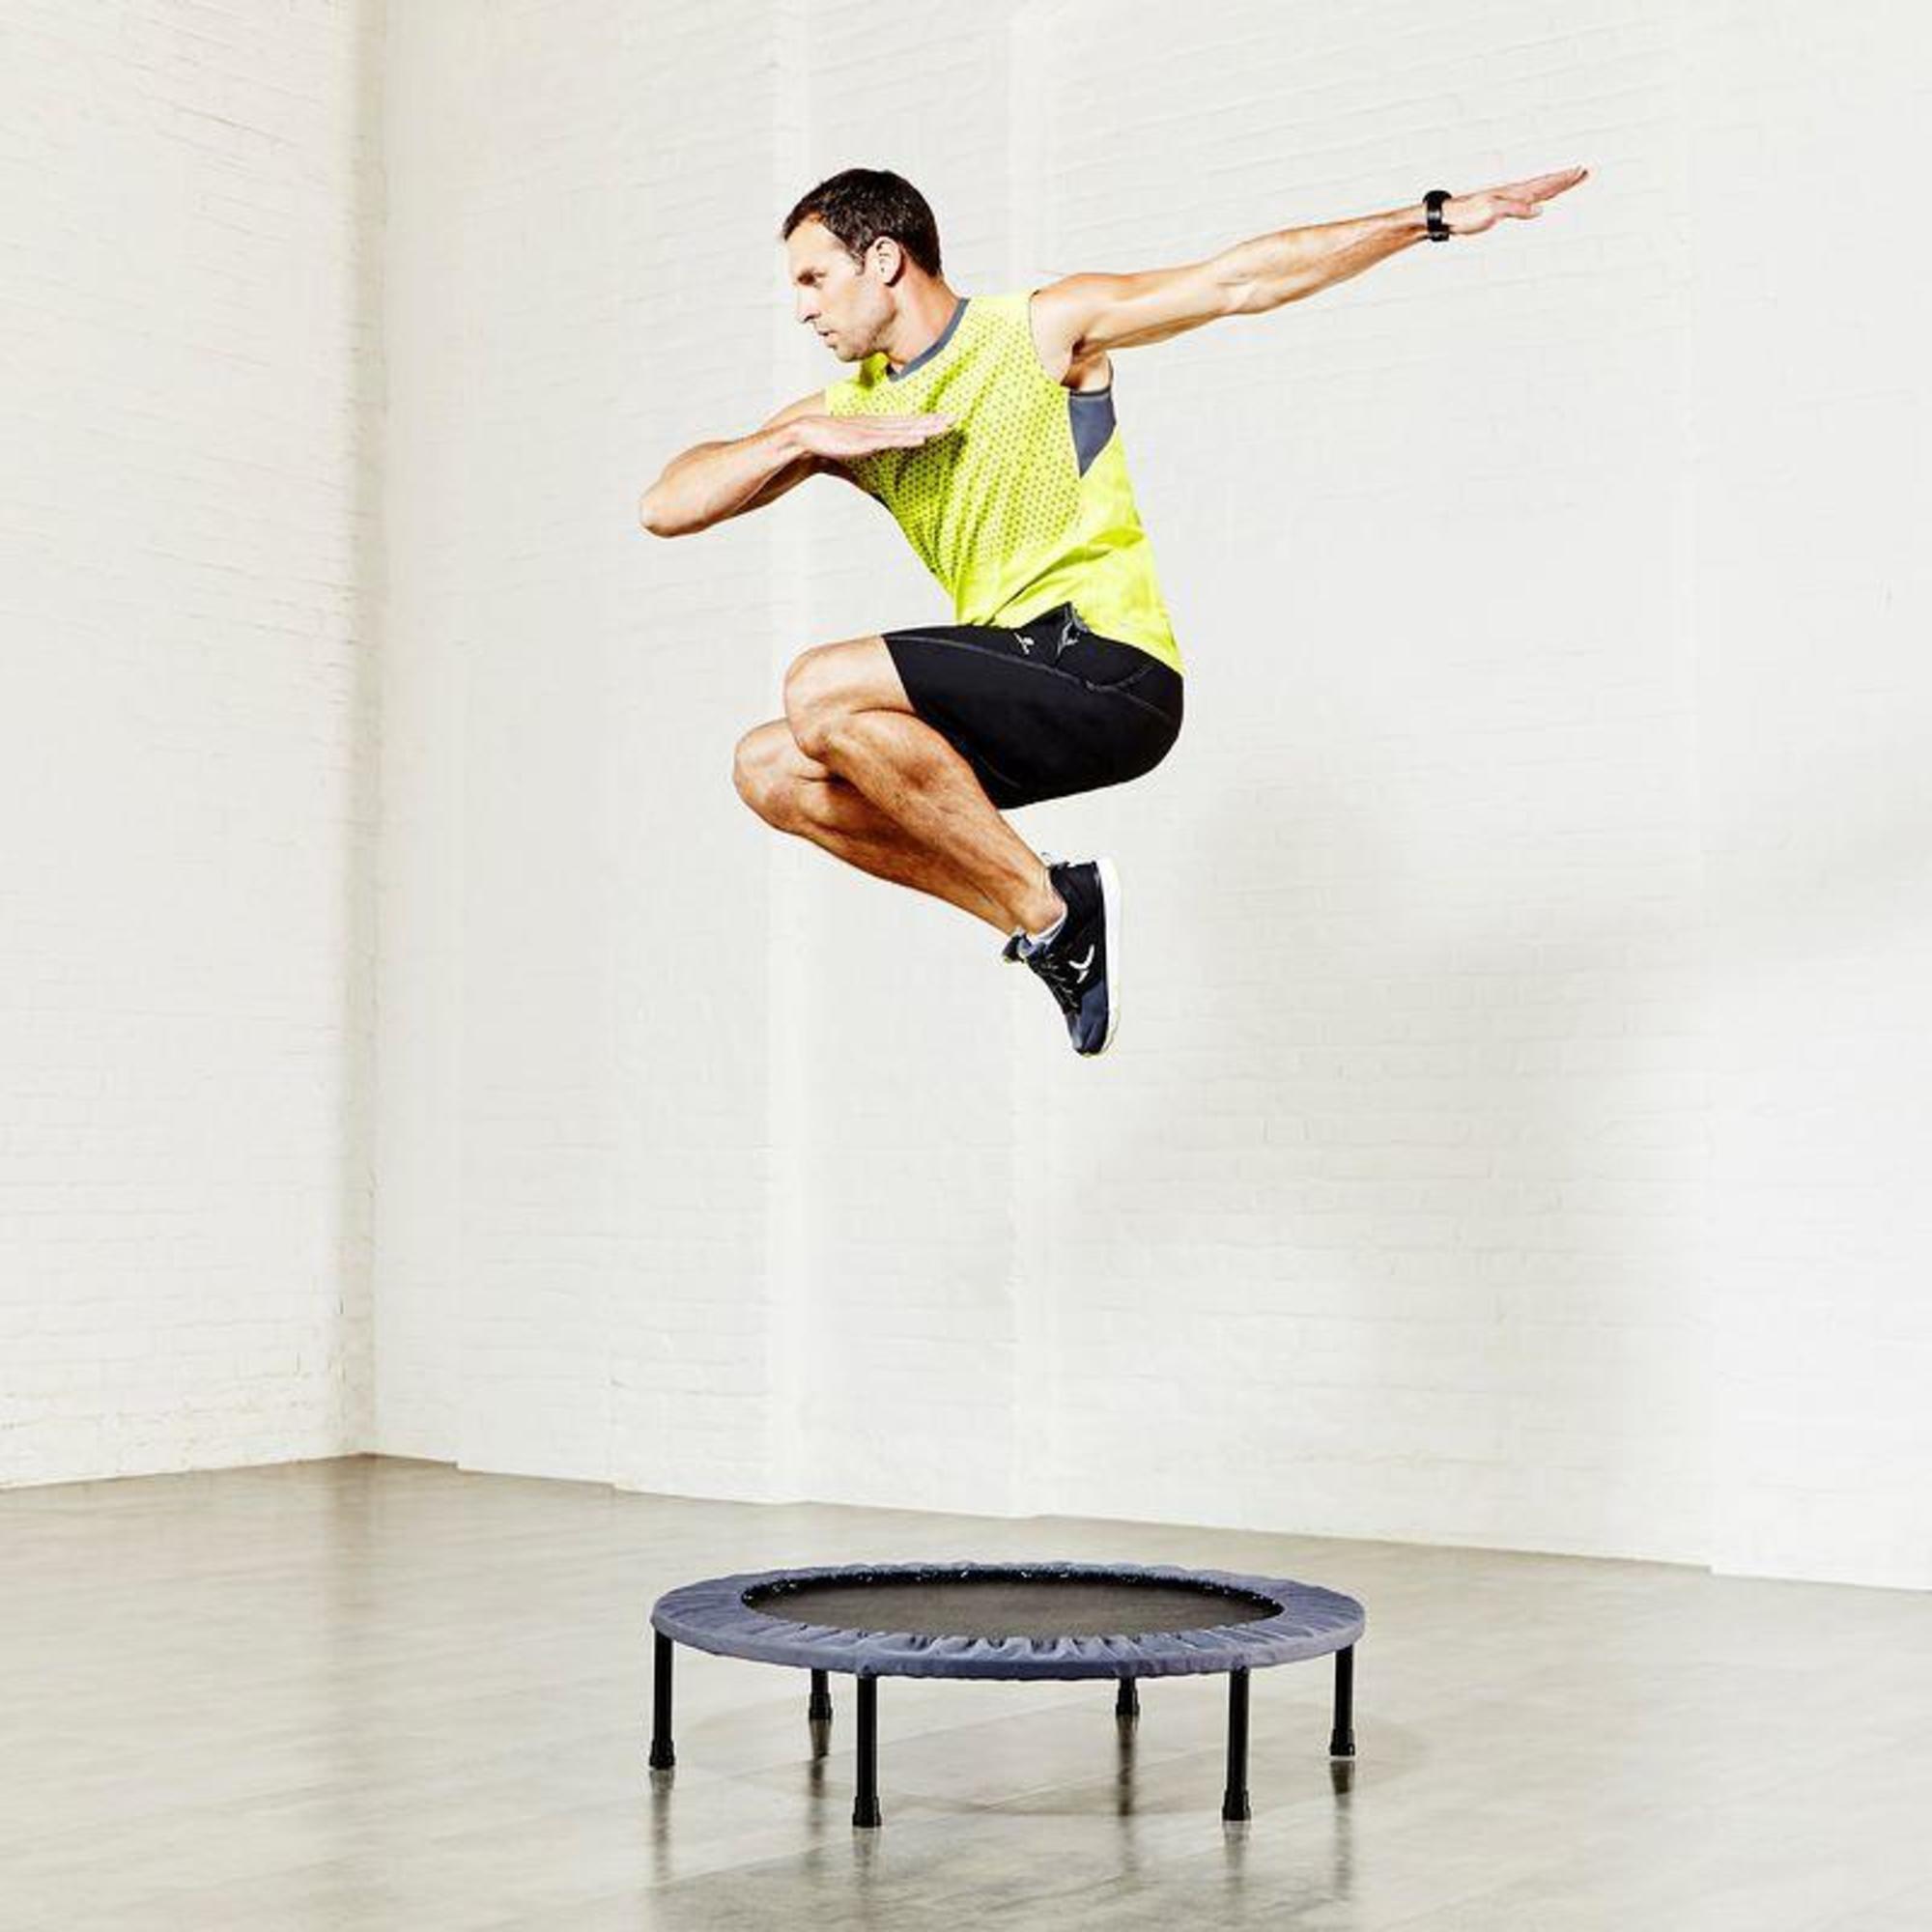 loi ich suc khoe cua bai tap trampoline